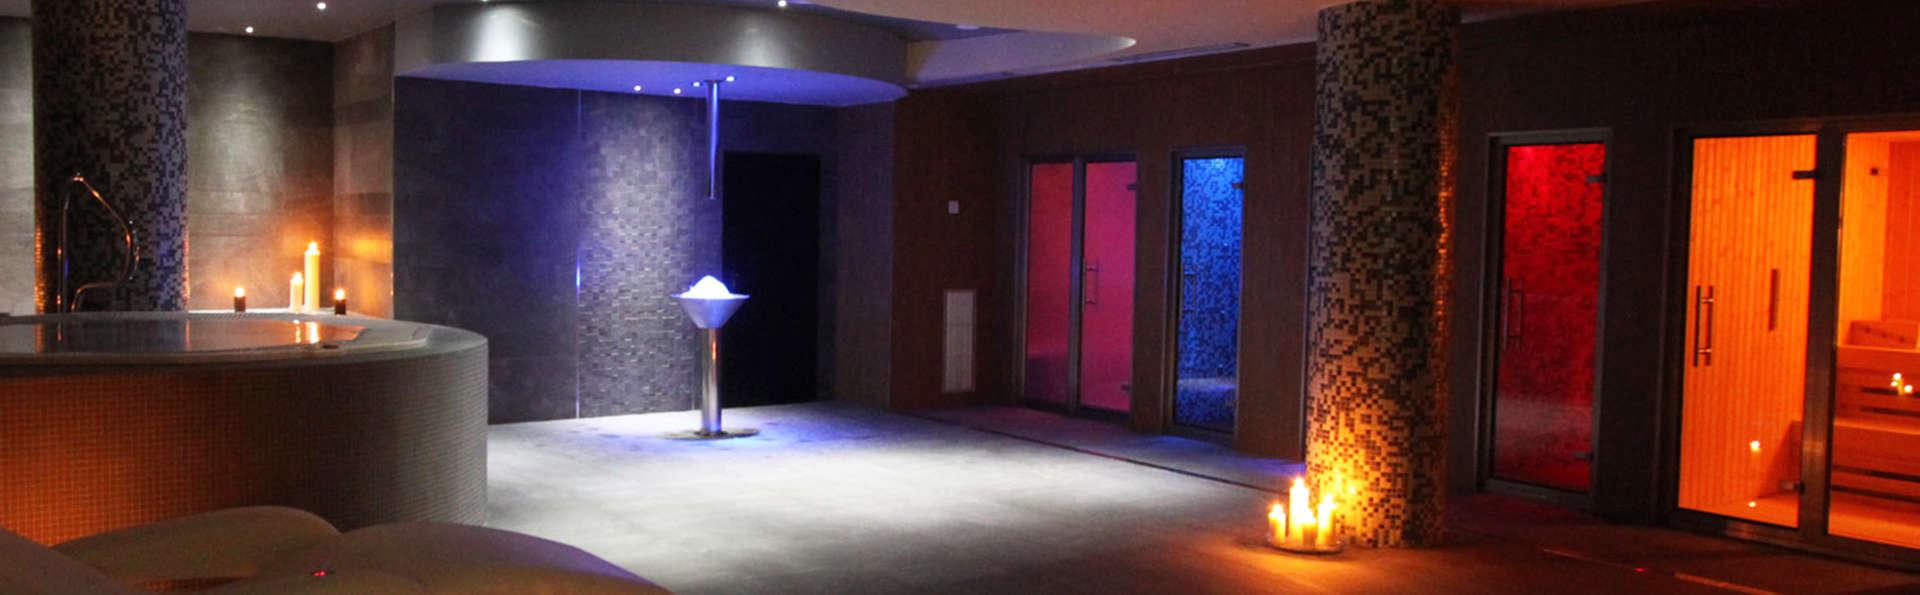 Hotel & Spa Real Jaca - edit_spa.jpg